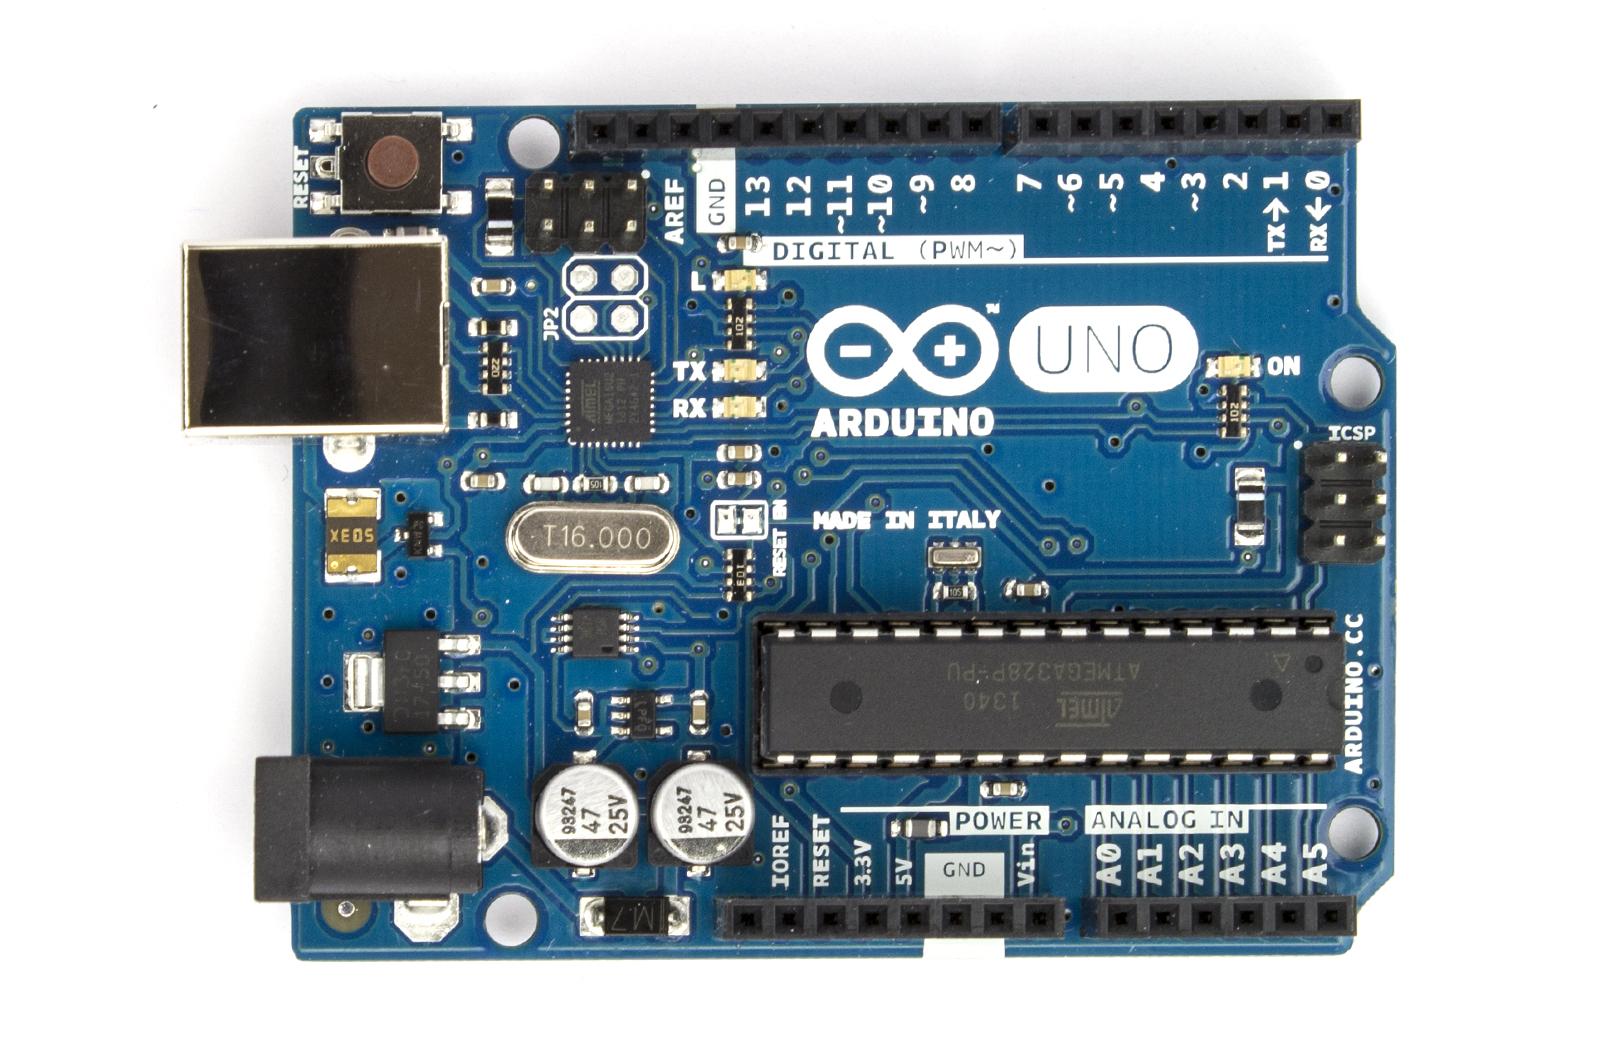 Arduino uno R3 (แถมสาย USB )